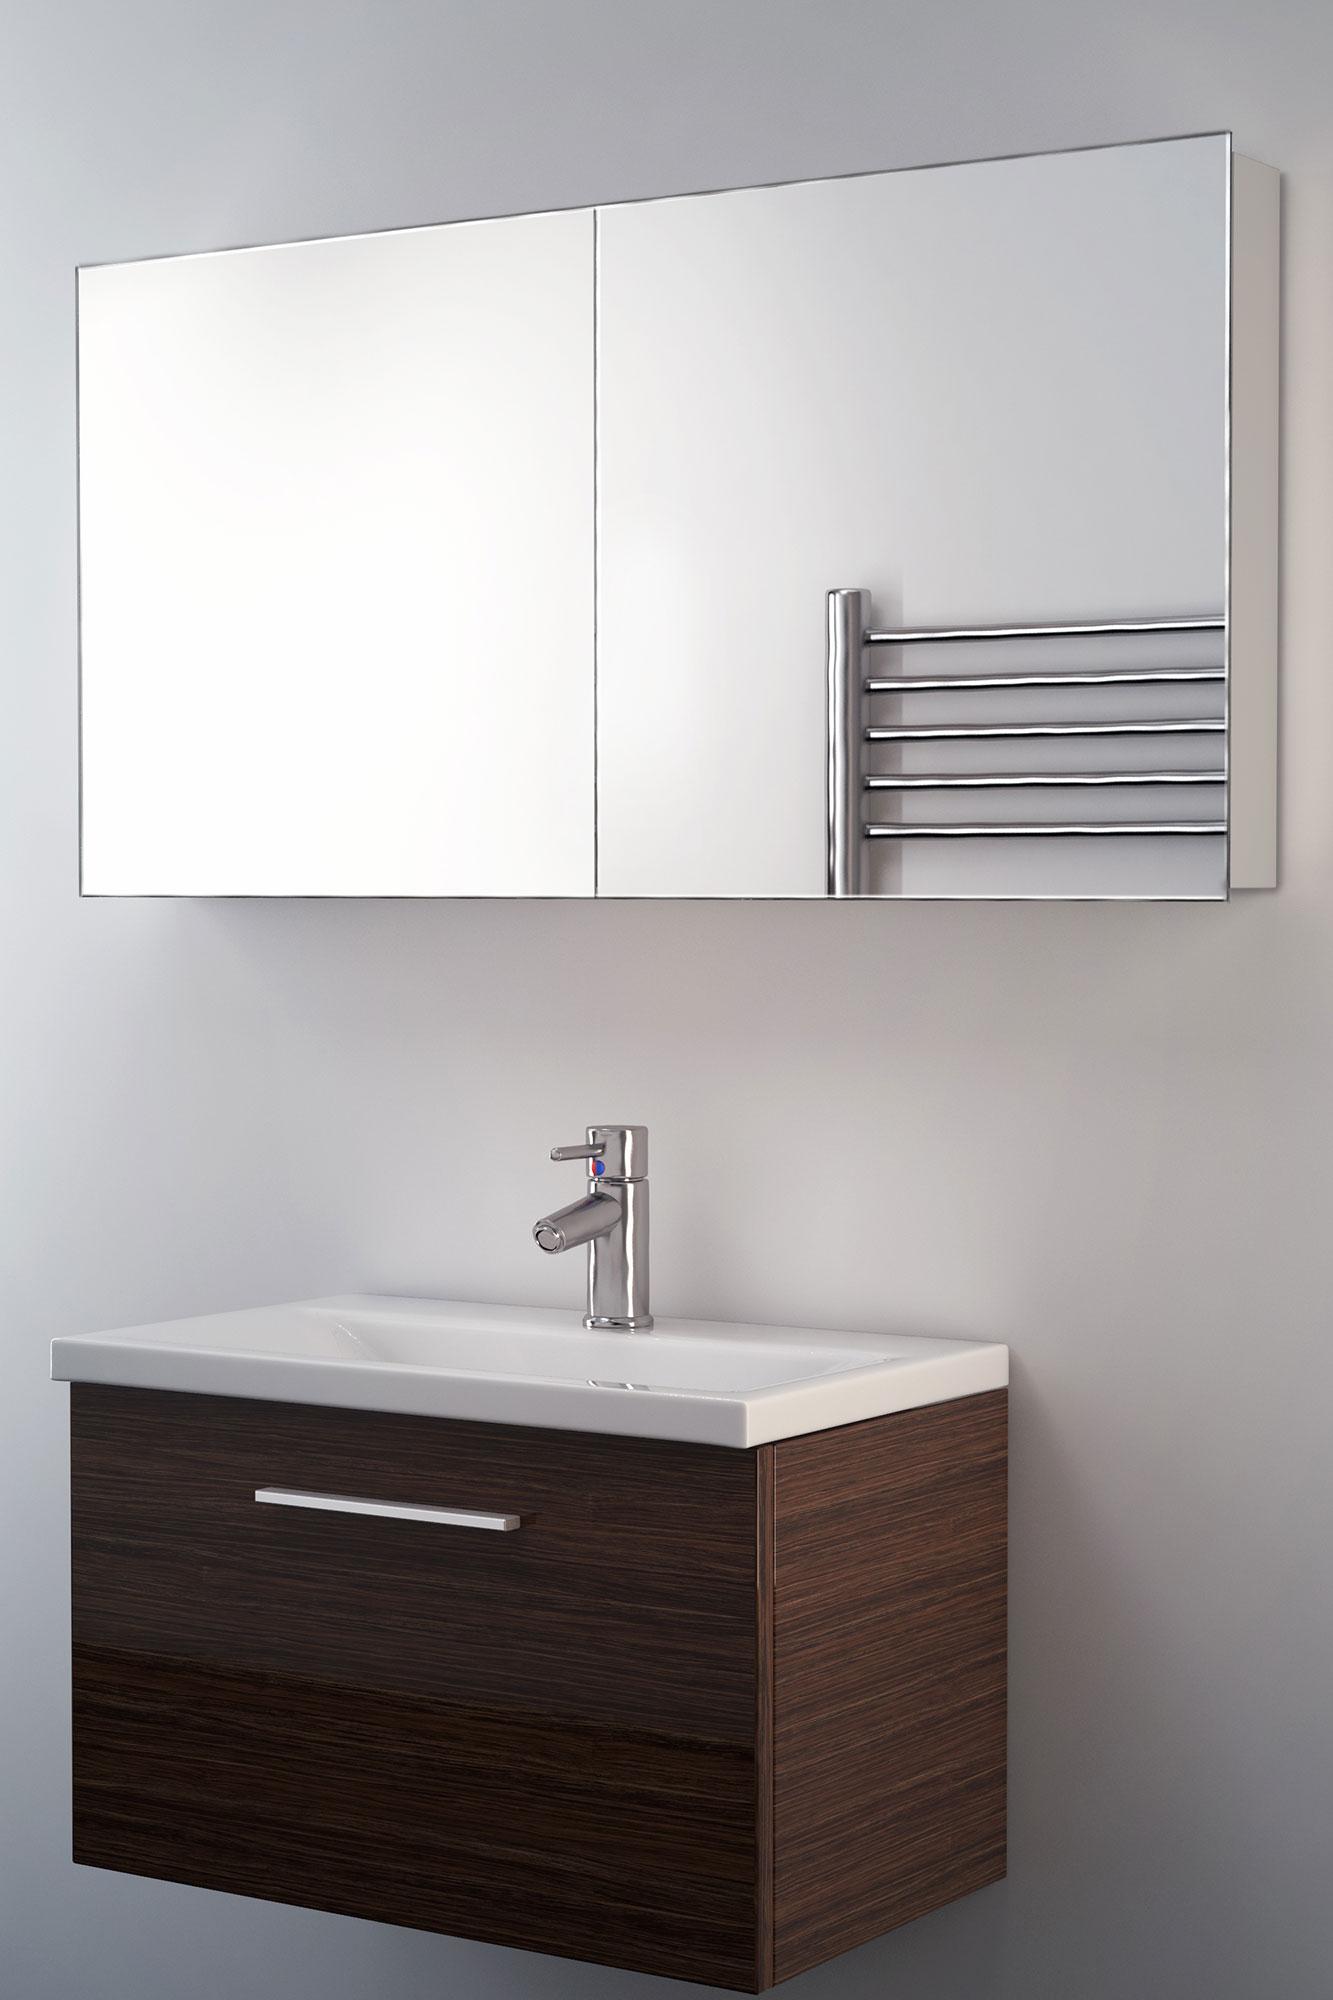 neptune non illuminated bathroom mirror cabinet k140 5055687001302 rh ebay co uk Bathroom Tower Cabinet Bathroom Mirror Cabinets with Lights